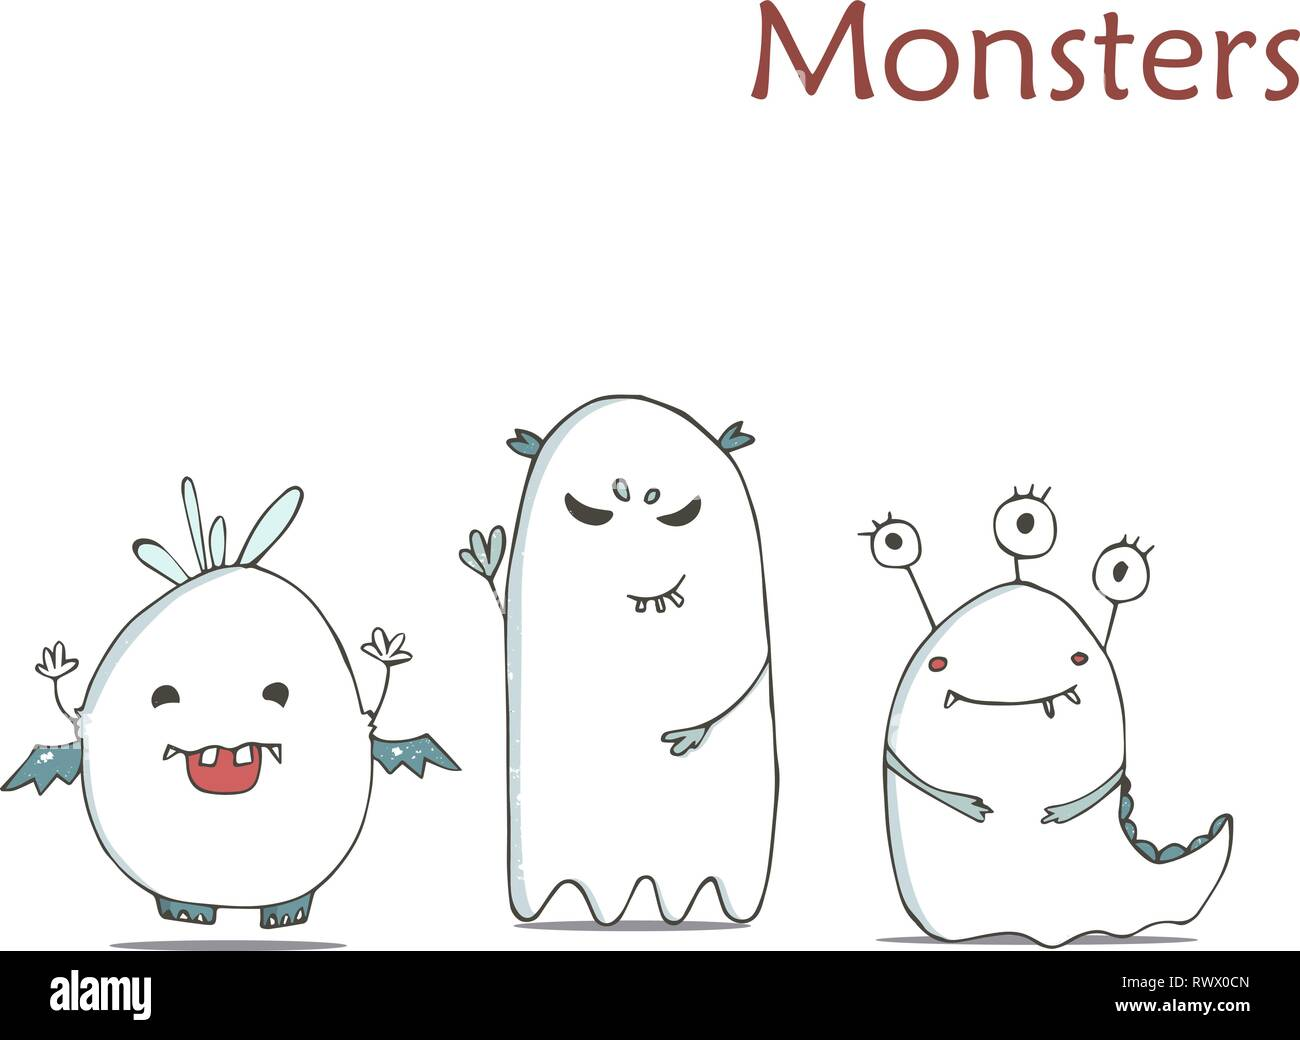 Set Of Cute Happy White Monster Hand Drawn Illustration Fluffy Cartoon Clip Art On White Background Stock Vector Image Art Alamy